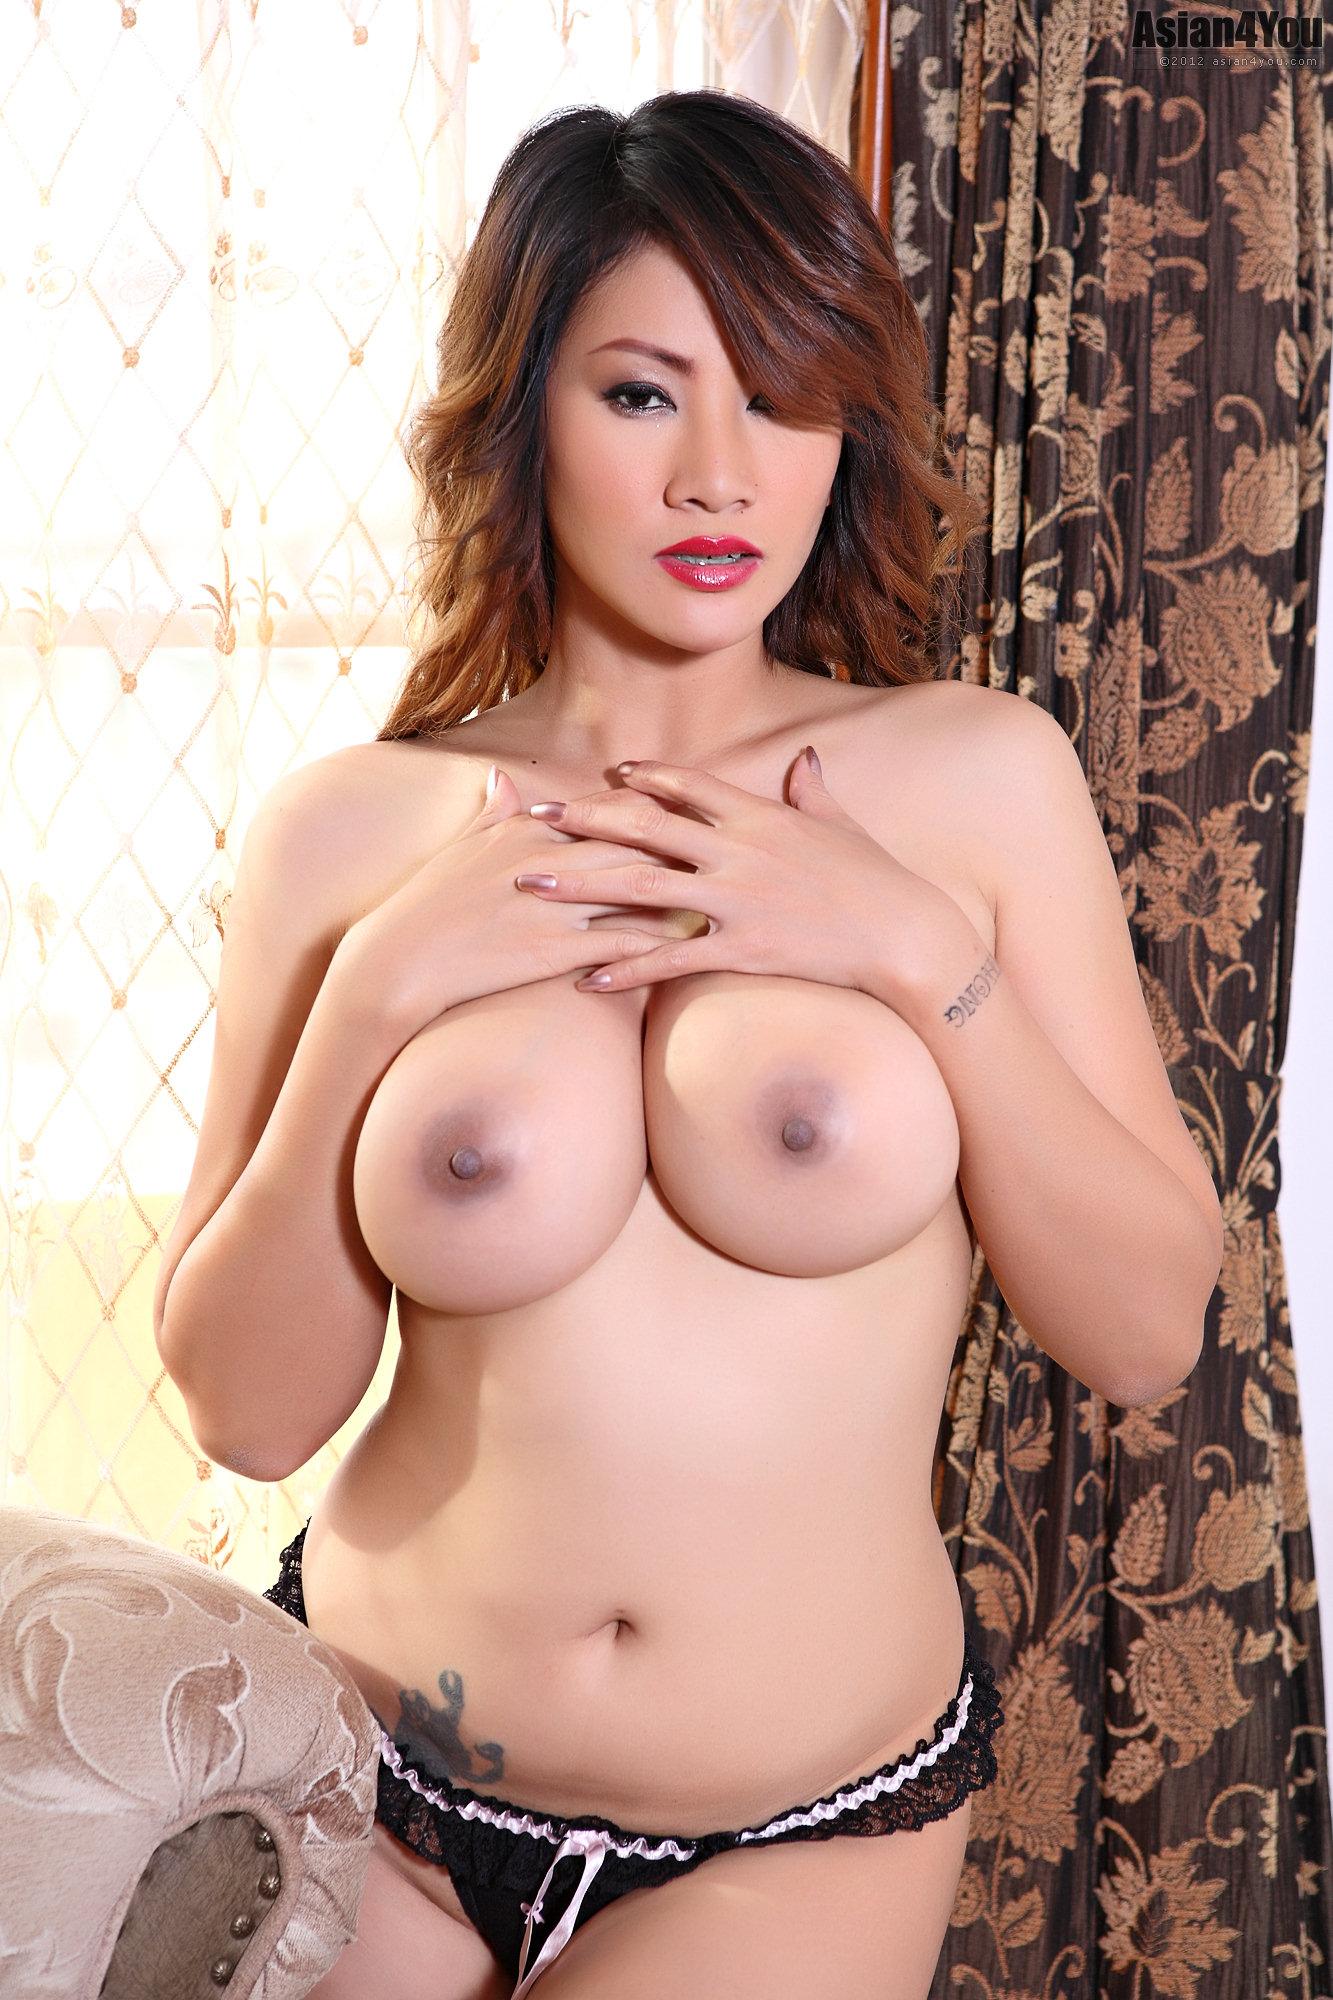 Rule minecraft girl steve porn hot girls wallpaper_pic15933